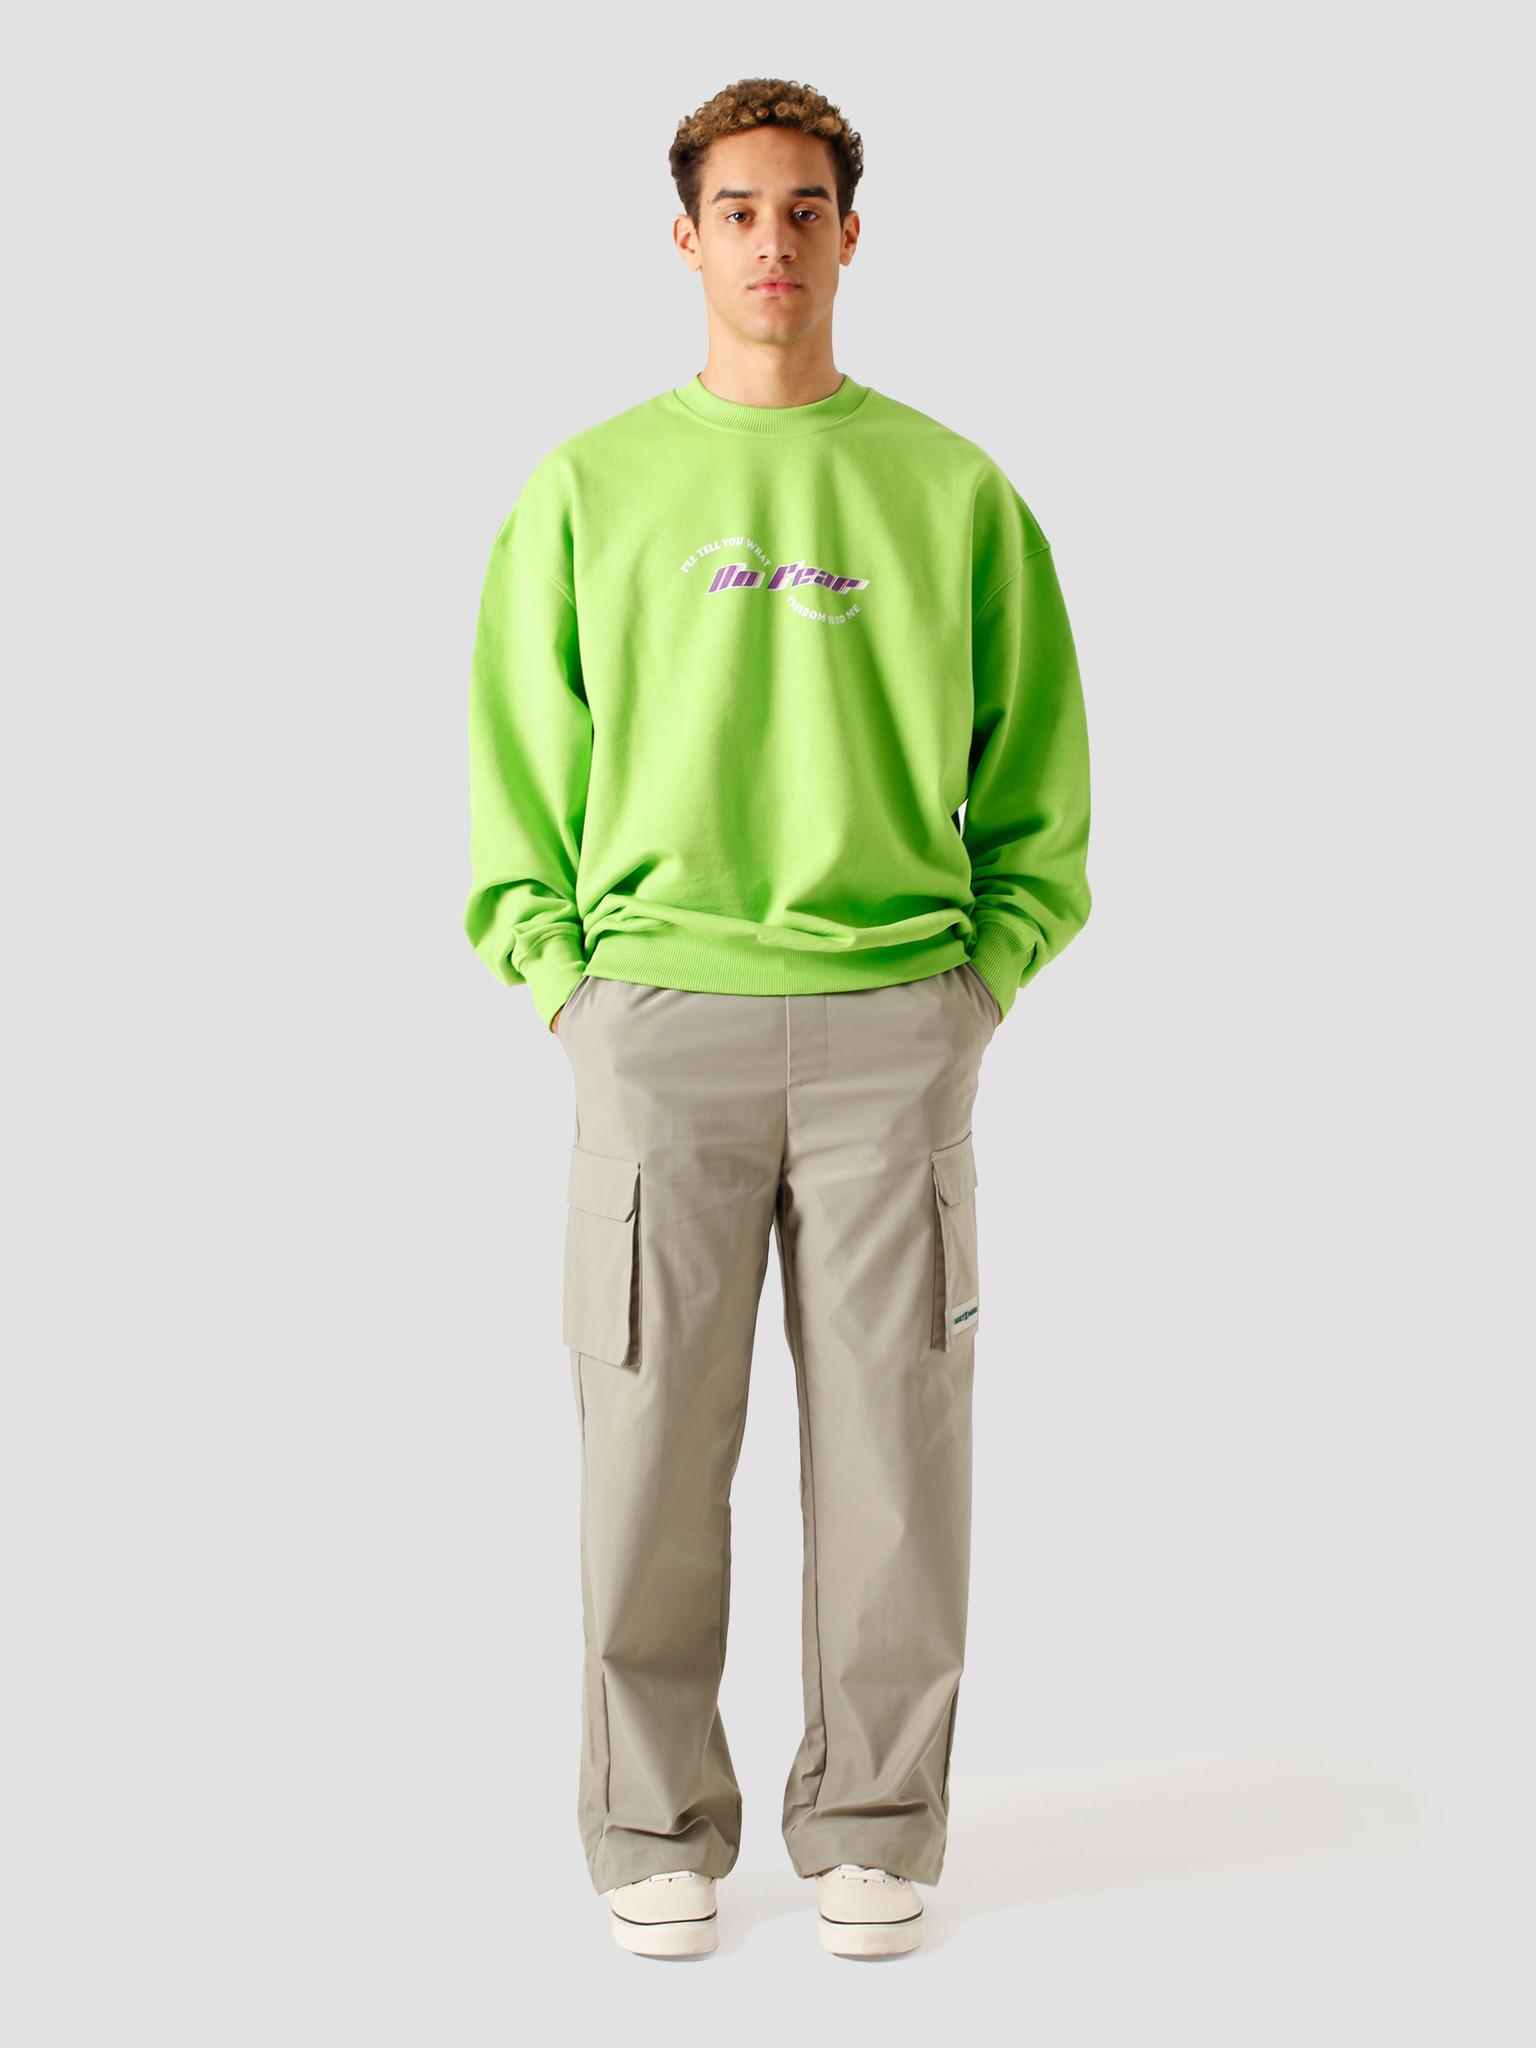 Daily Paper Daily Paper Kerjas Oversized T-Shirt Jasmine Green 2111145